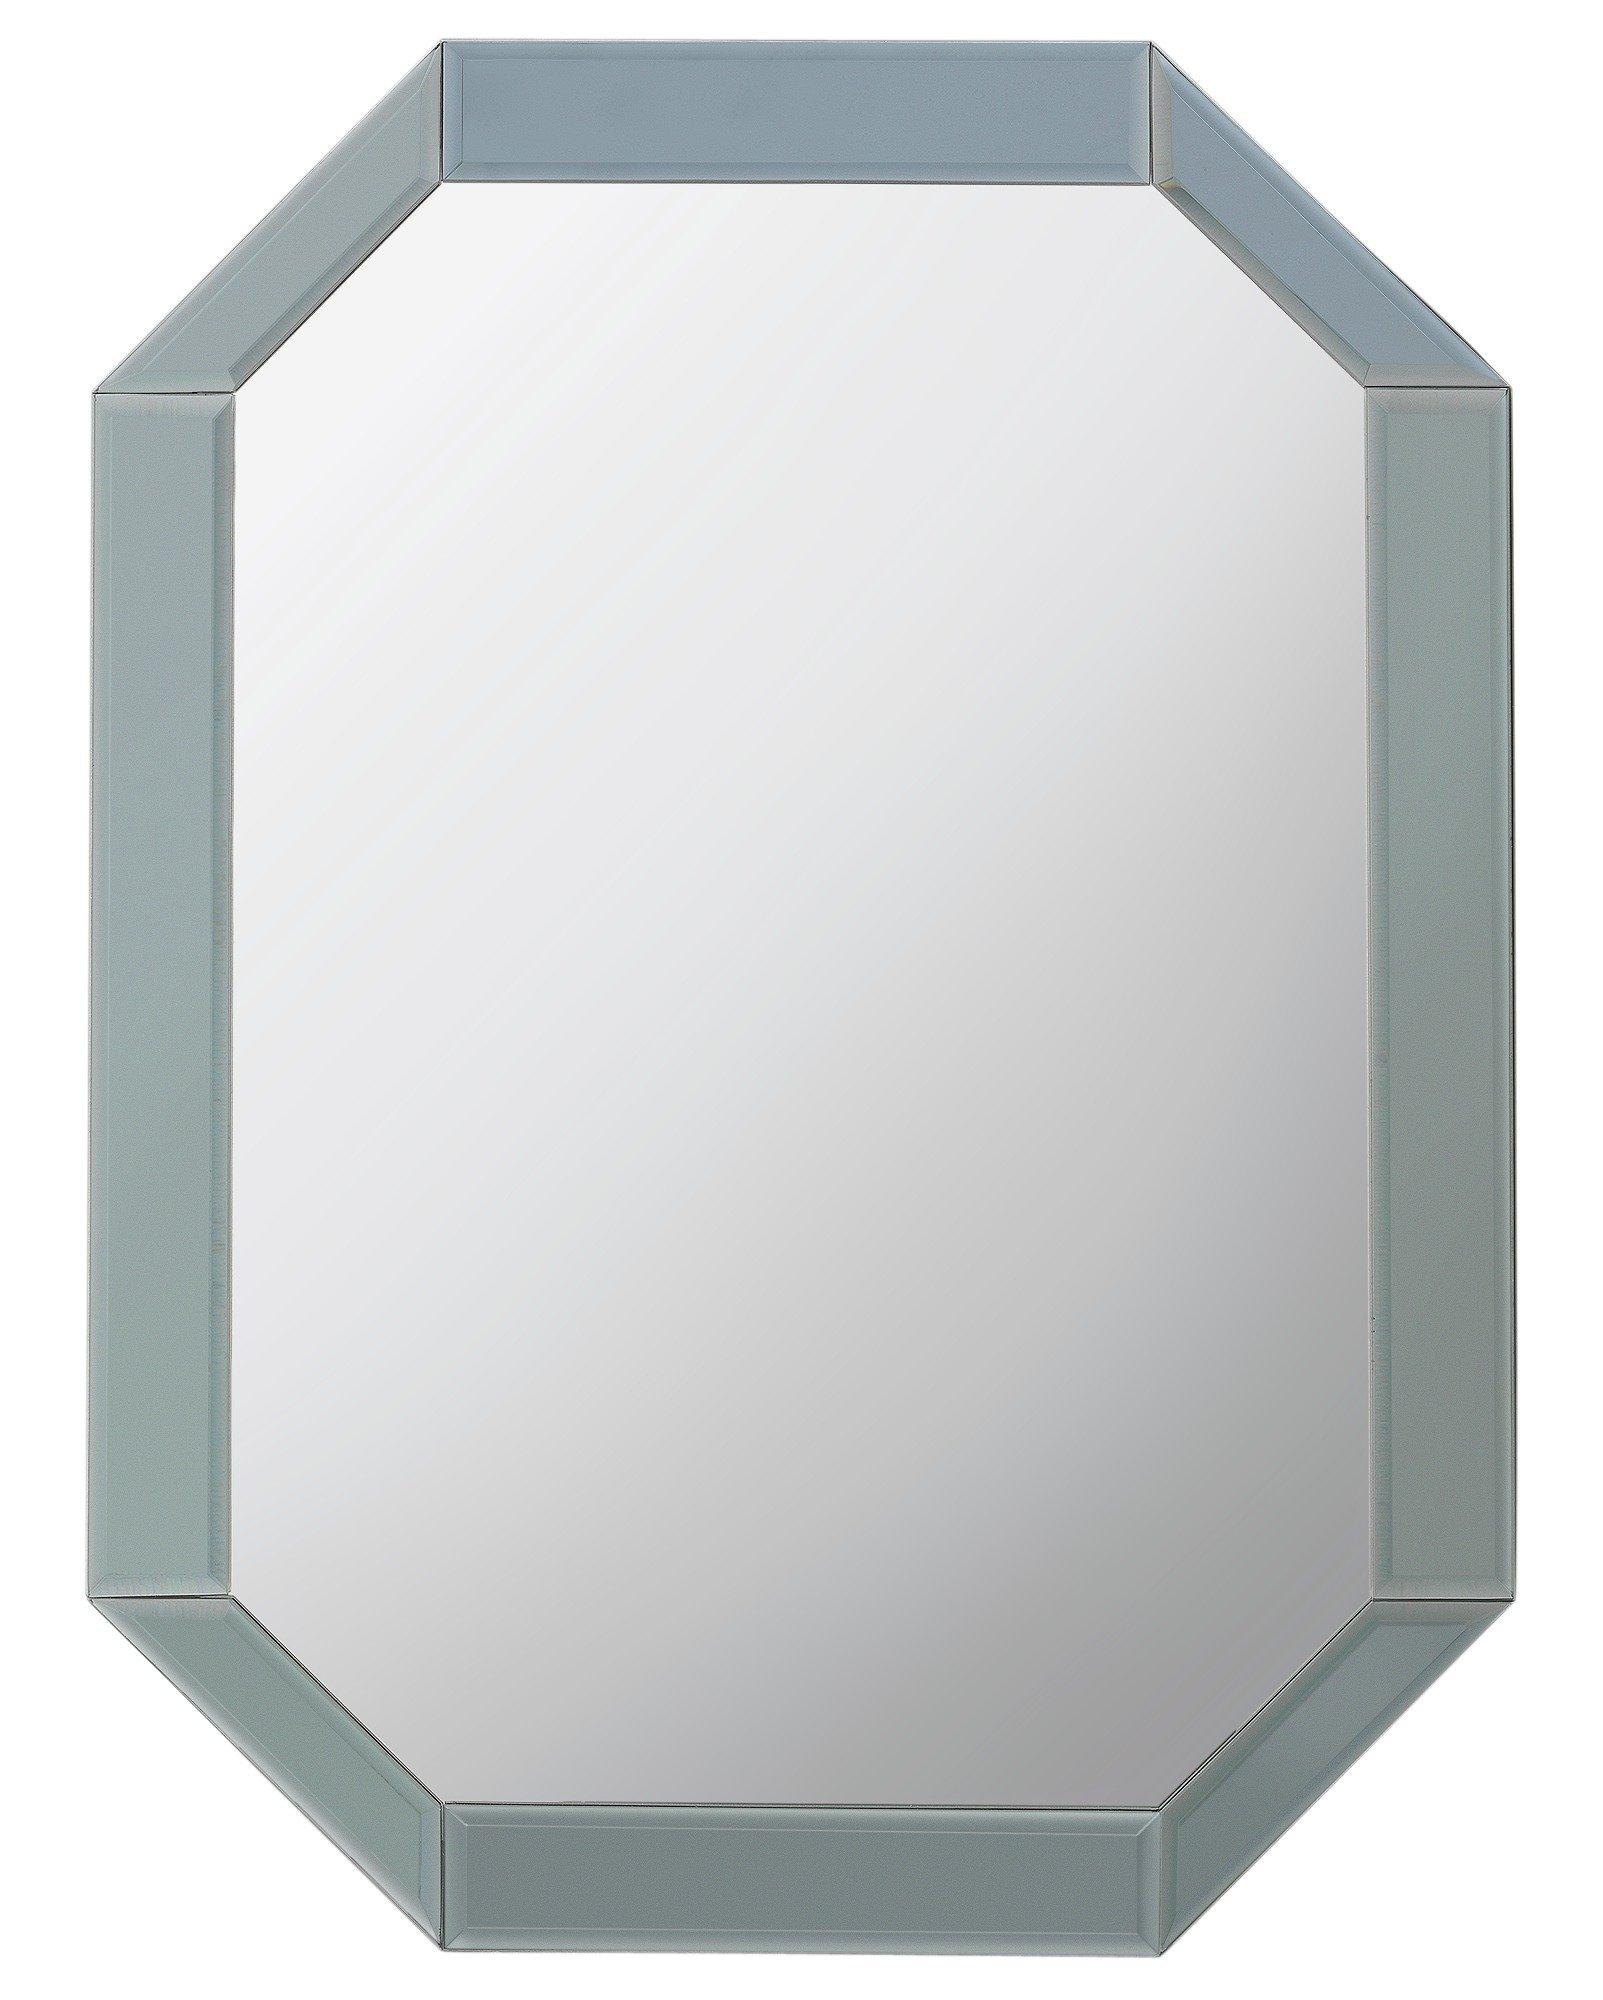 Argos Home Stonehaven Octagonal Bevelled Mirror - Grey